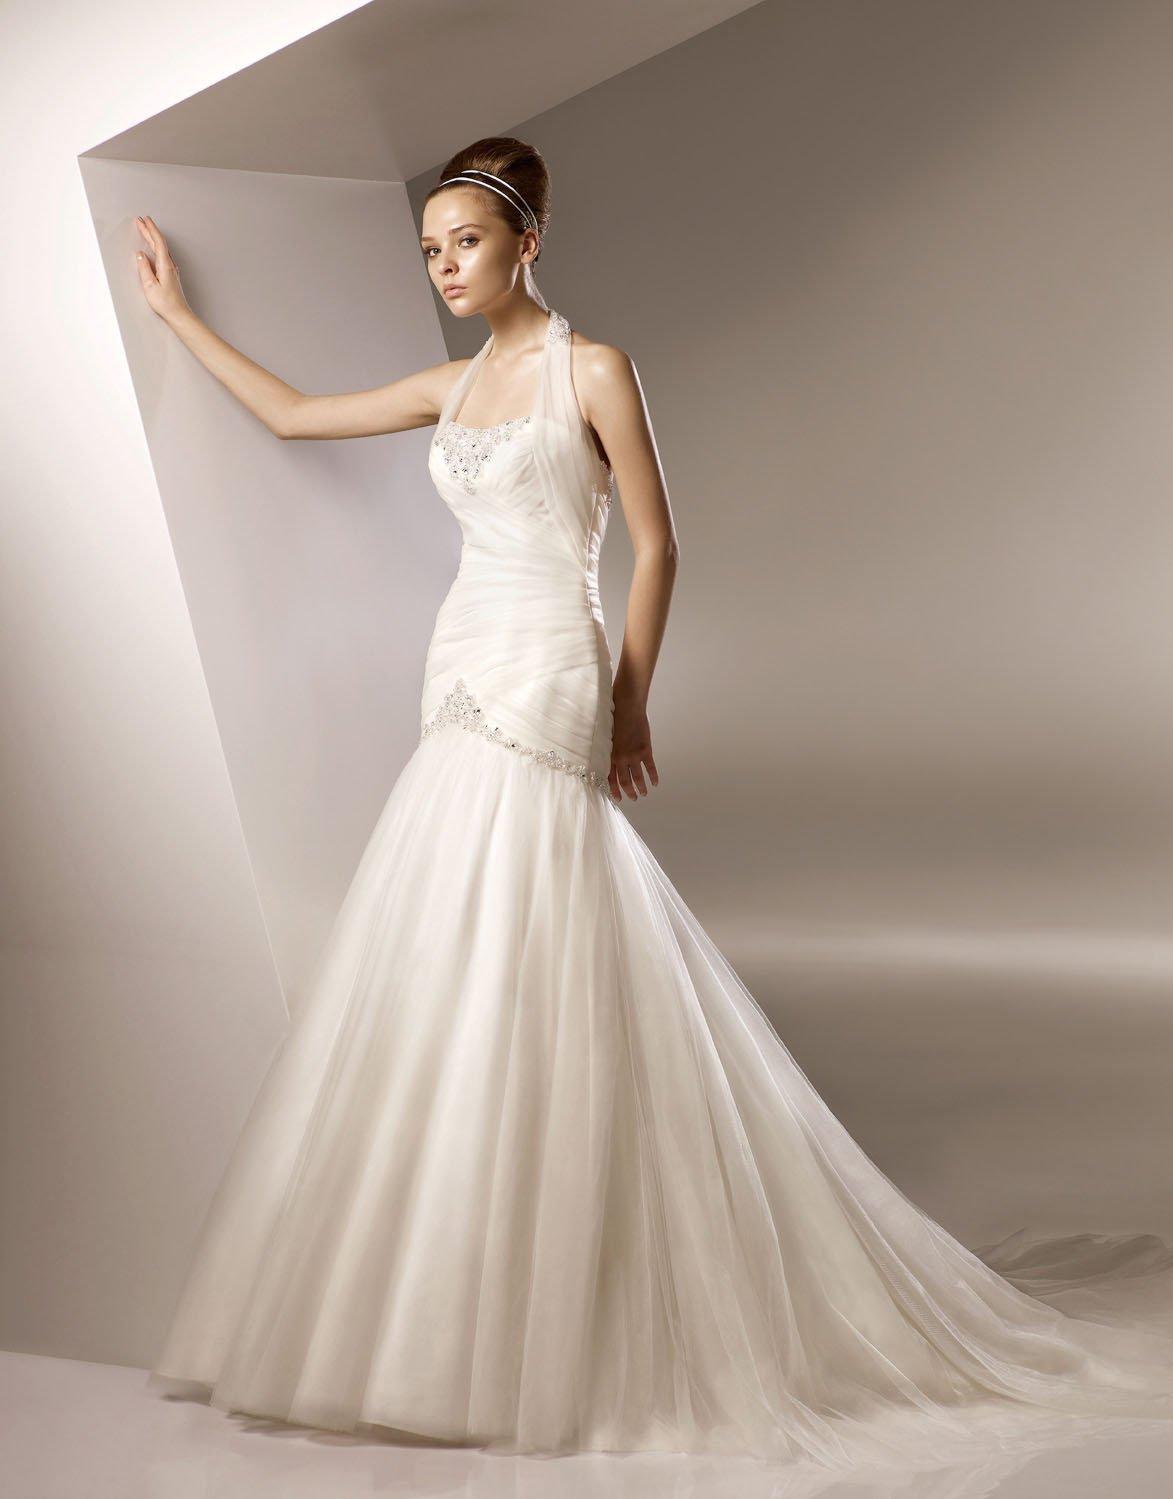 Halter Appliqued Beading Organza Train Wedding Dress Bridal Gown aq0026